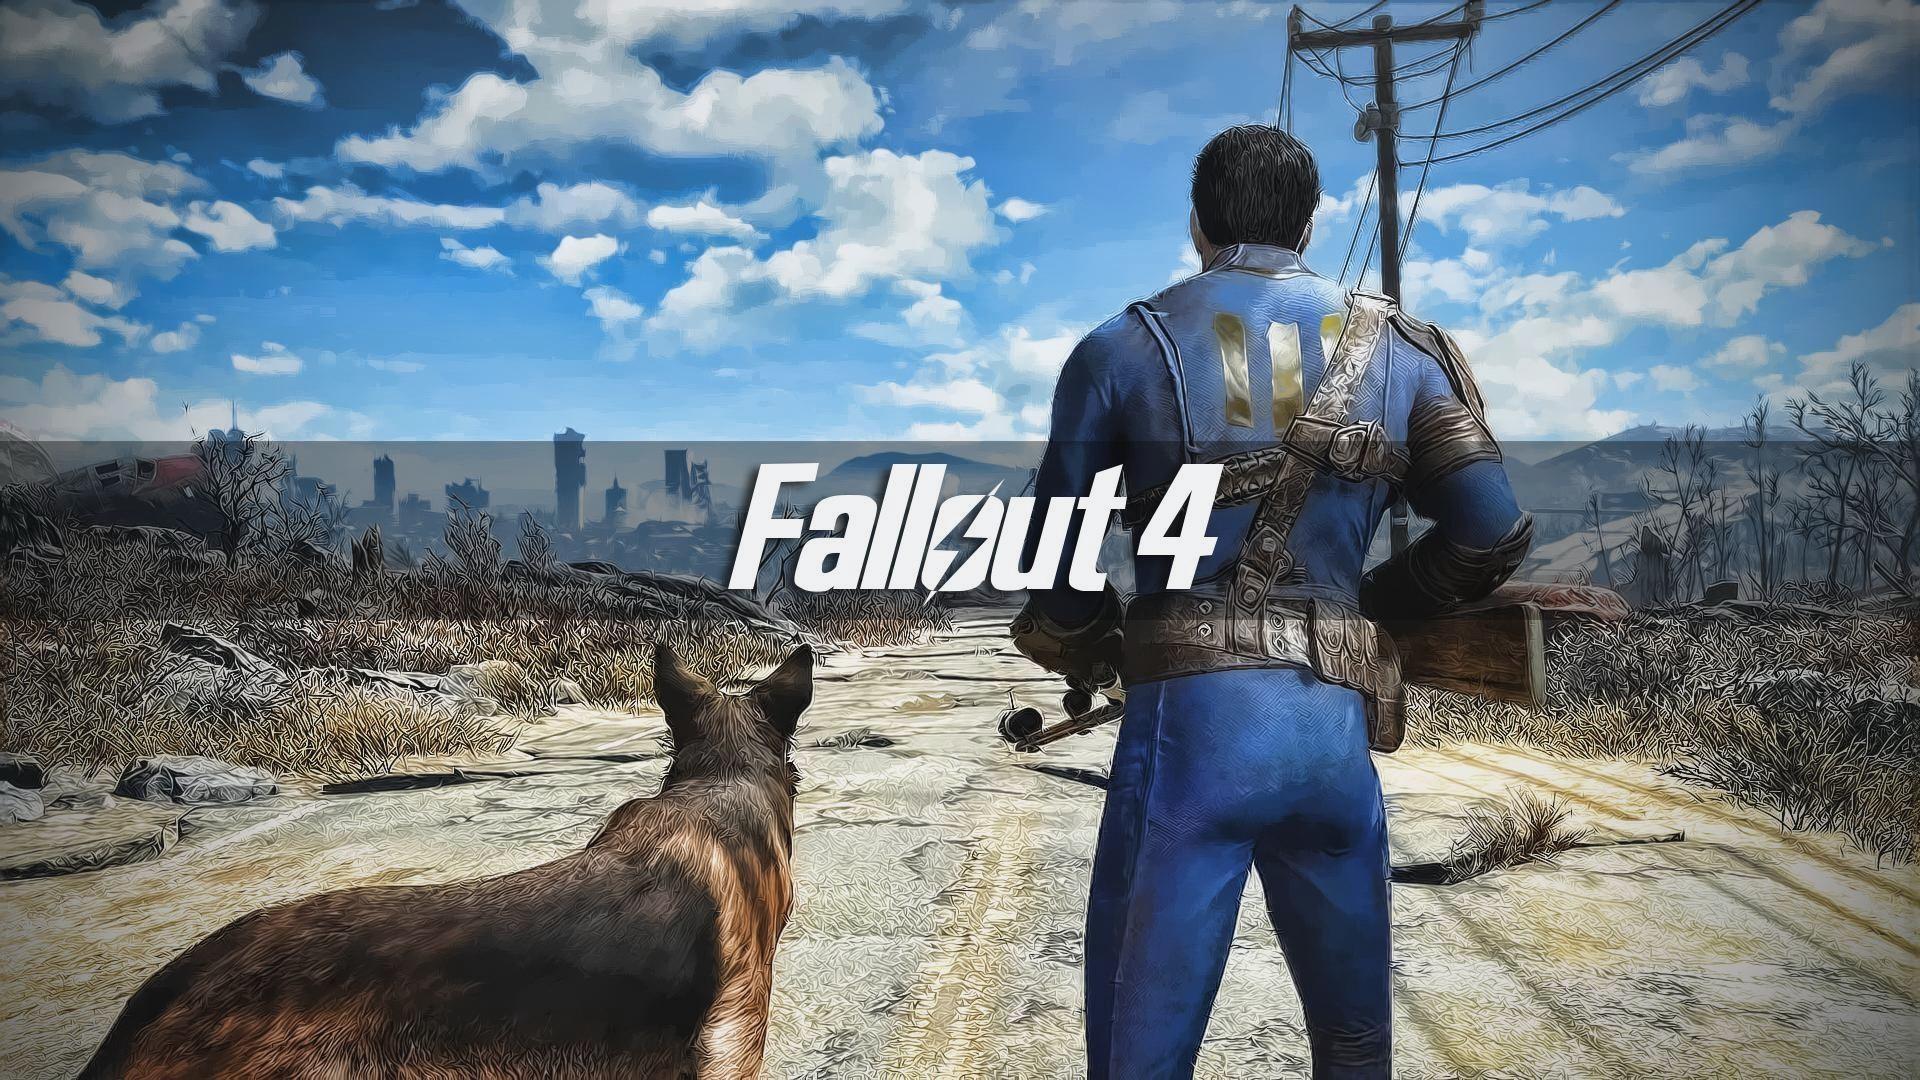 Fallout 4 desktop wallpaper